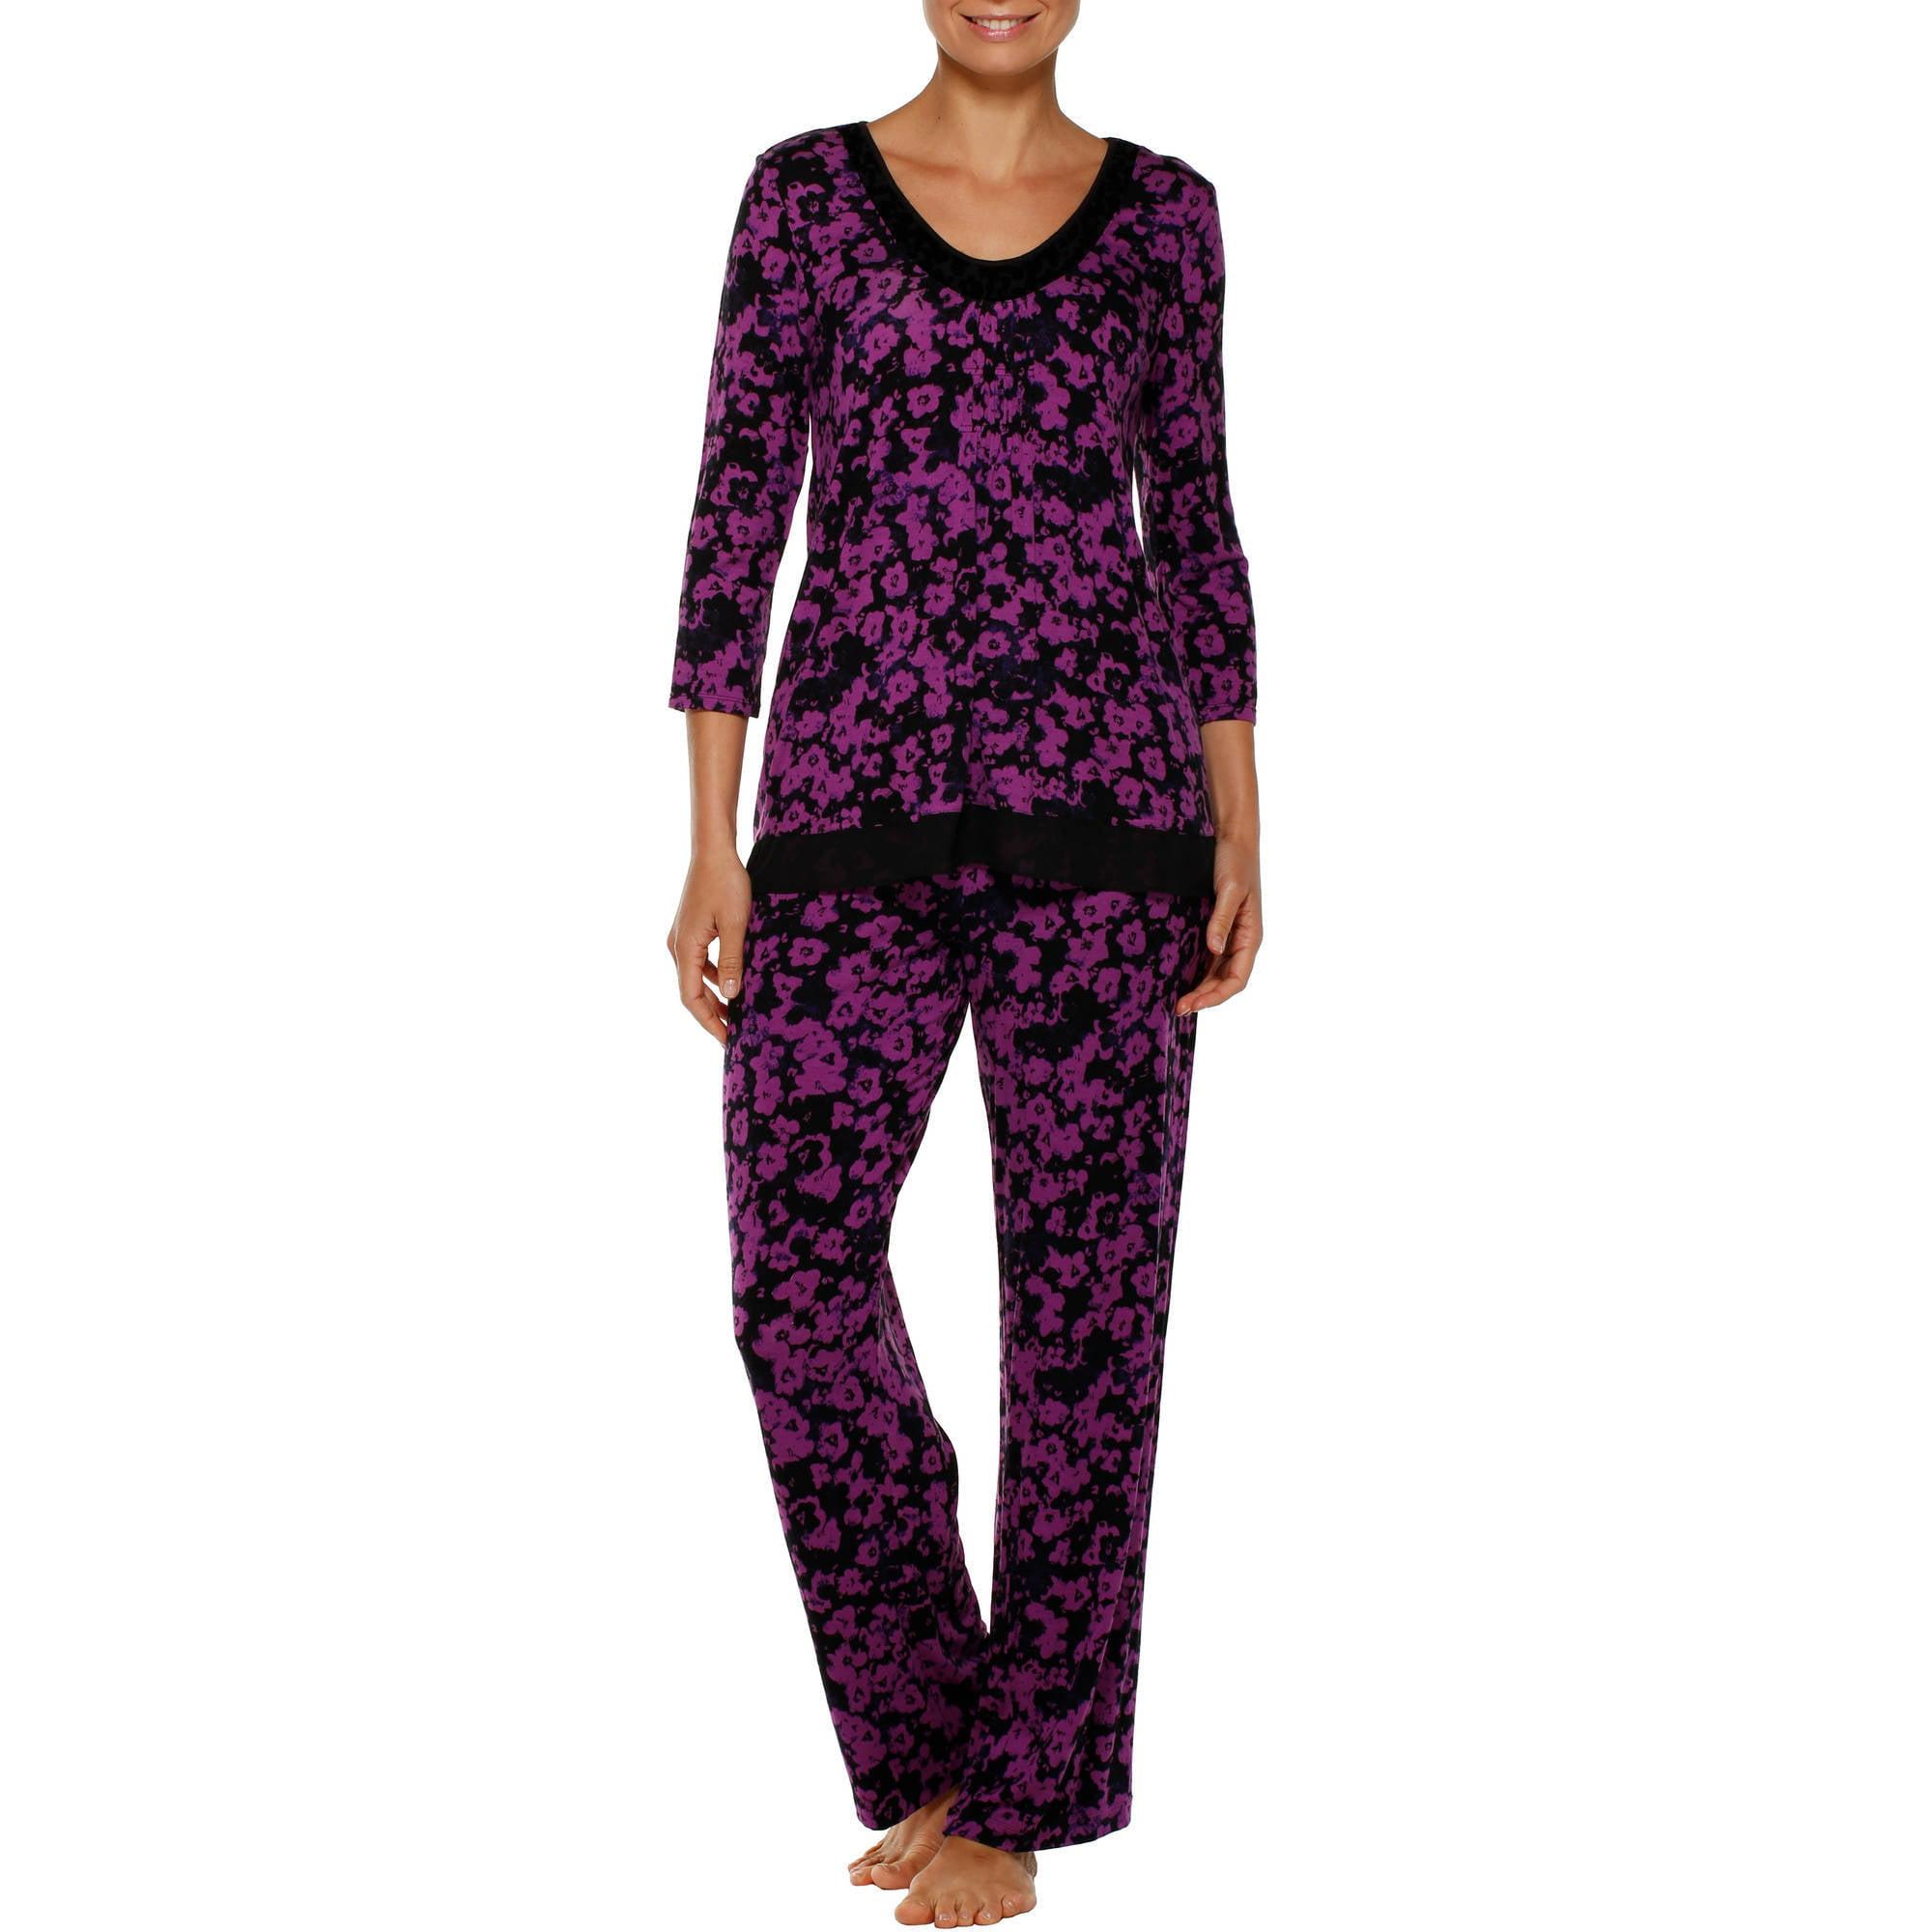 Secret Treasures Women's Rayon Long Sleeve Pajama Top with Rayon Sleep Pant 2 Piece Sleepwear Set